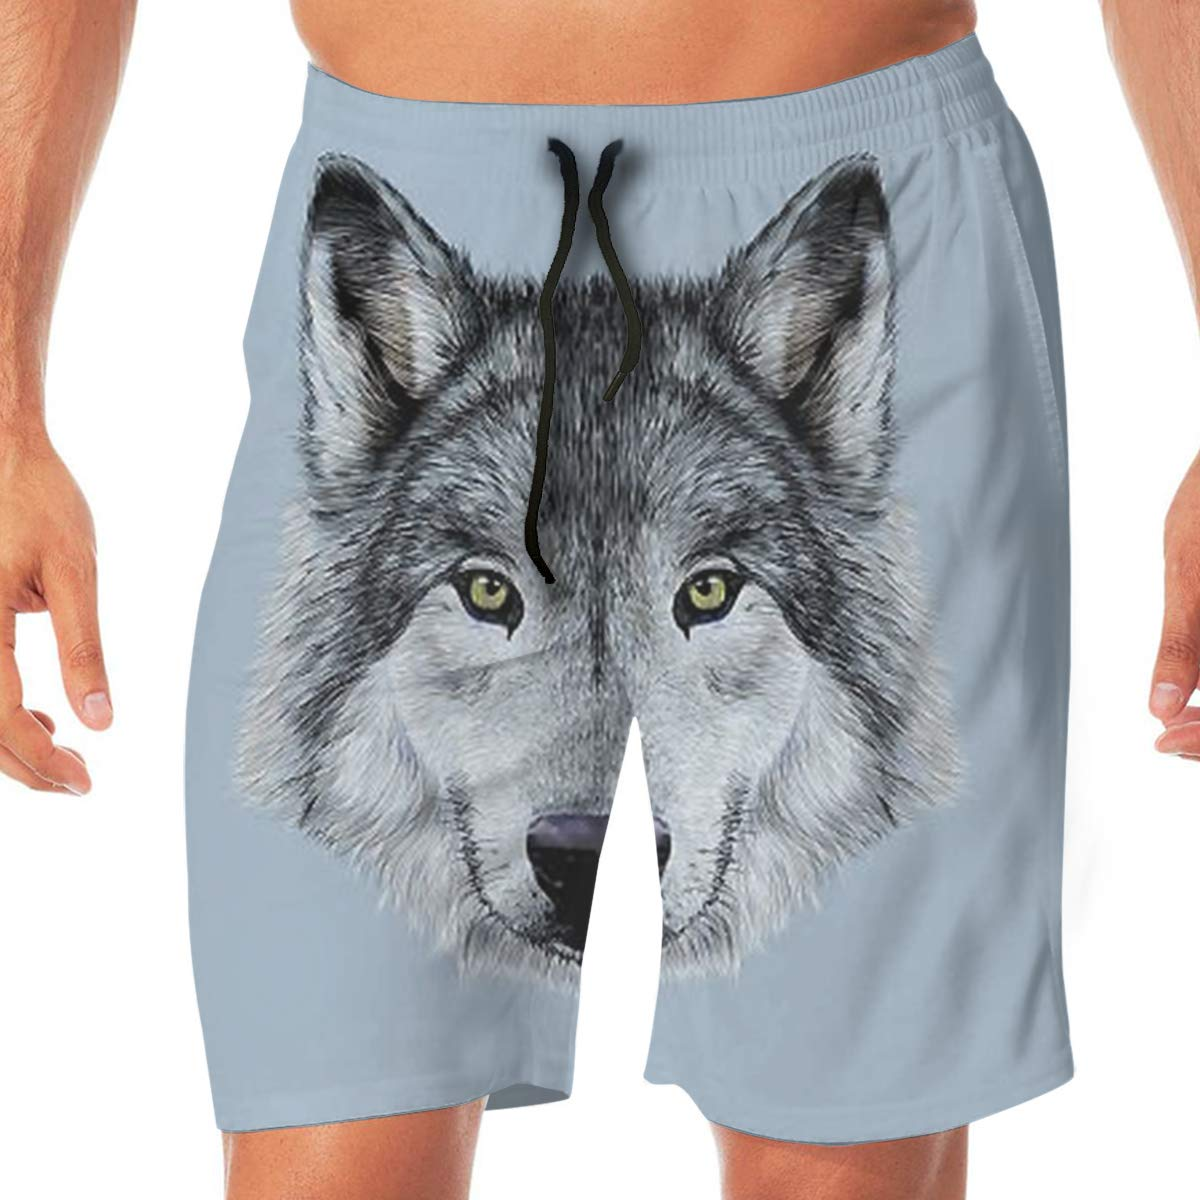 MaoYTUI Wolf Beautiful Animal Mens Swim Trunks Boys Quick Dry Bathing Suits Drawstring Waist Beach Broad Shorts Swim Suit Beachwear with Mesh Lining